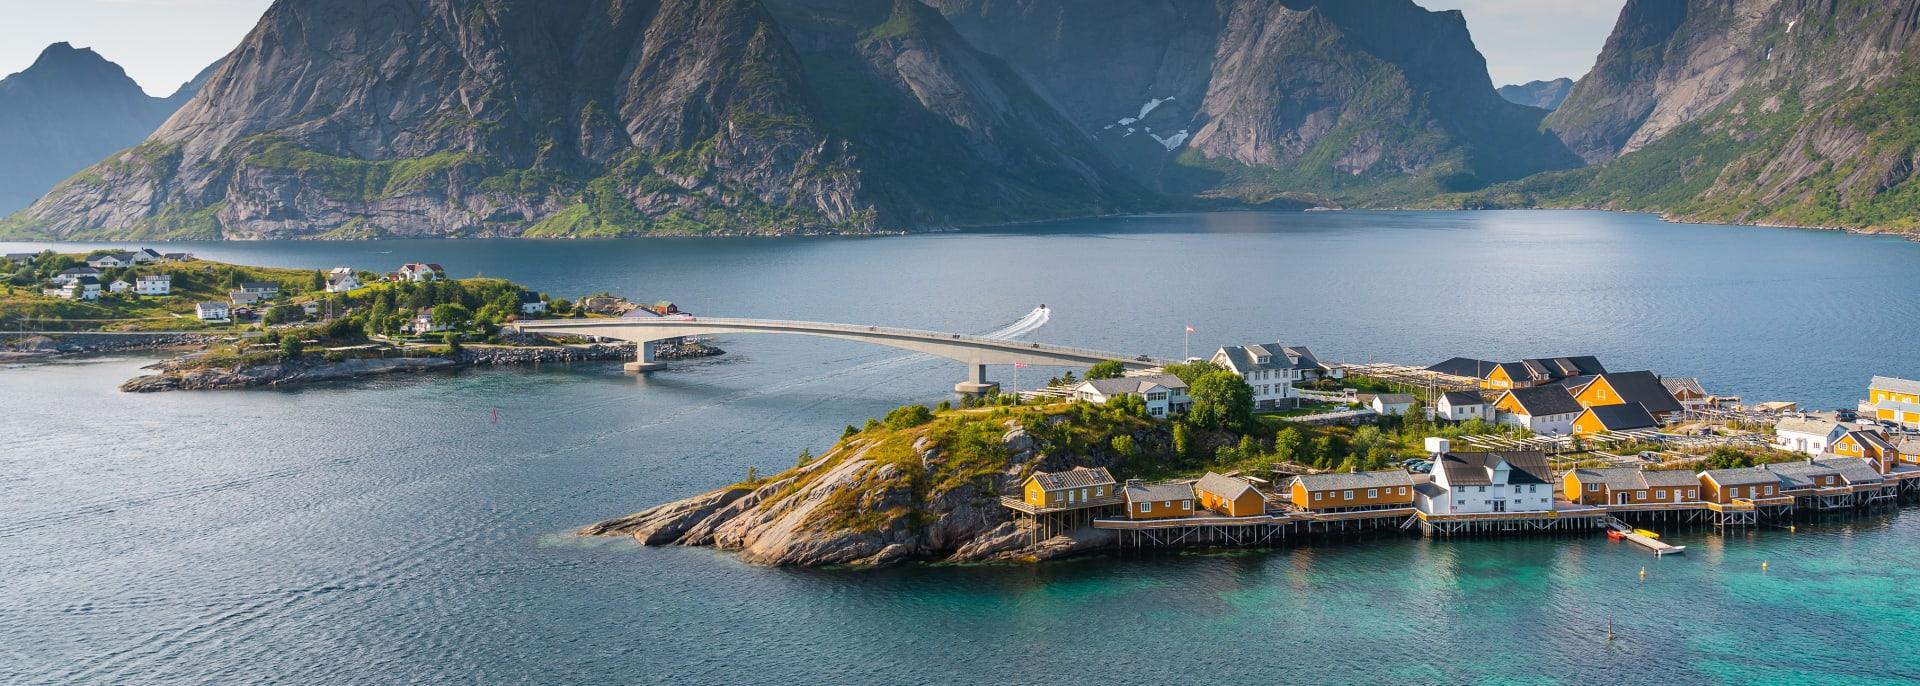 Sakrisoisches Fischerdorf, Norwegen